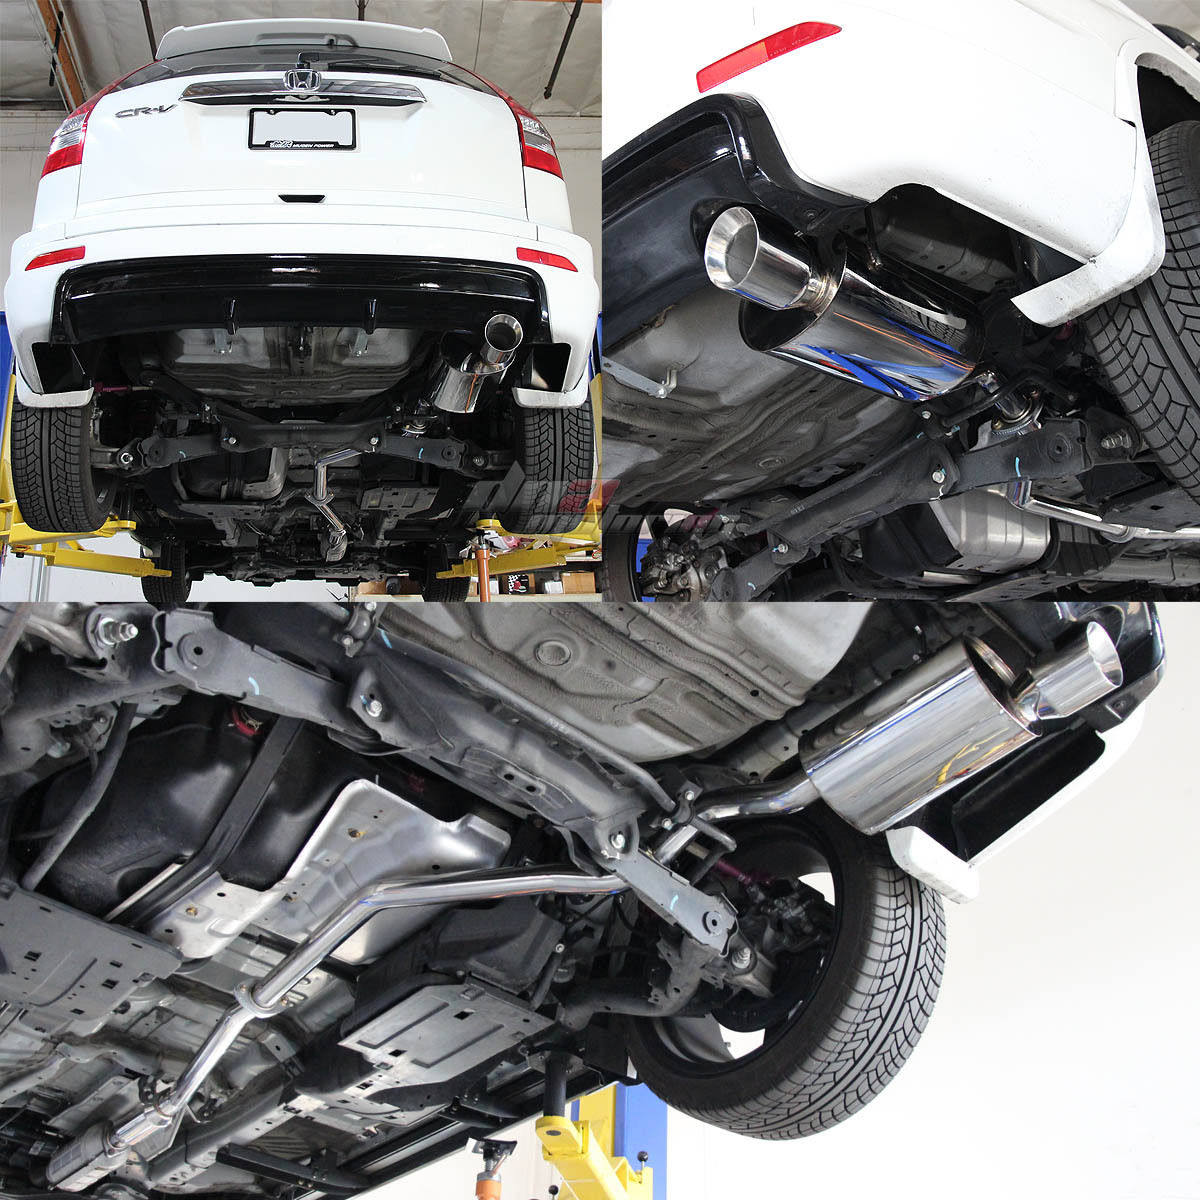 Image Result For Honda Crv Sound System | 2017/2018 Honda ...